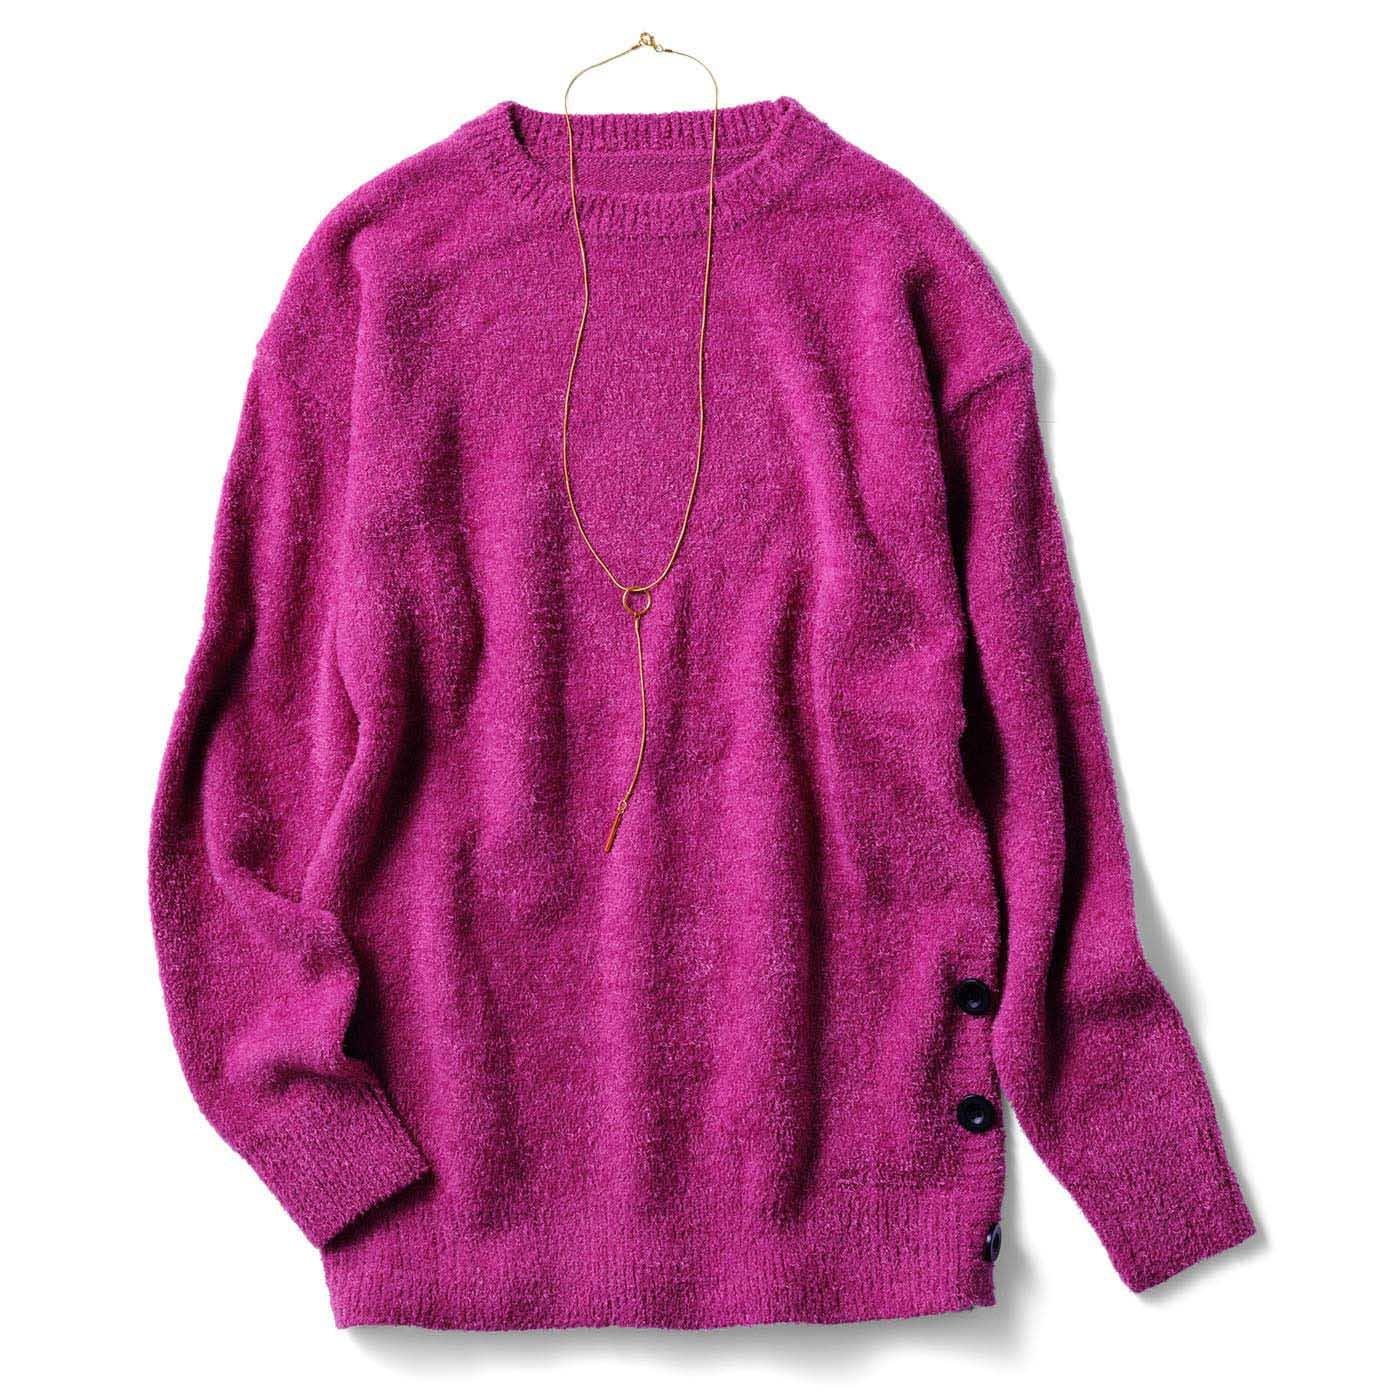 IEDIT×TOPLOG 冬のコーデが華やぐネックレス付きティントカラーニット〈ベリーピンク〉